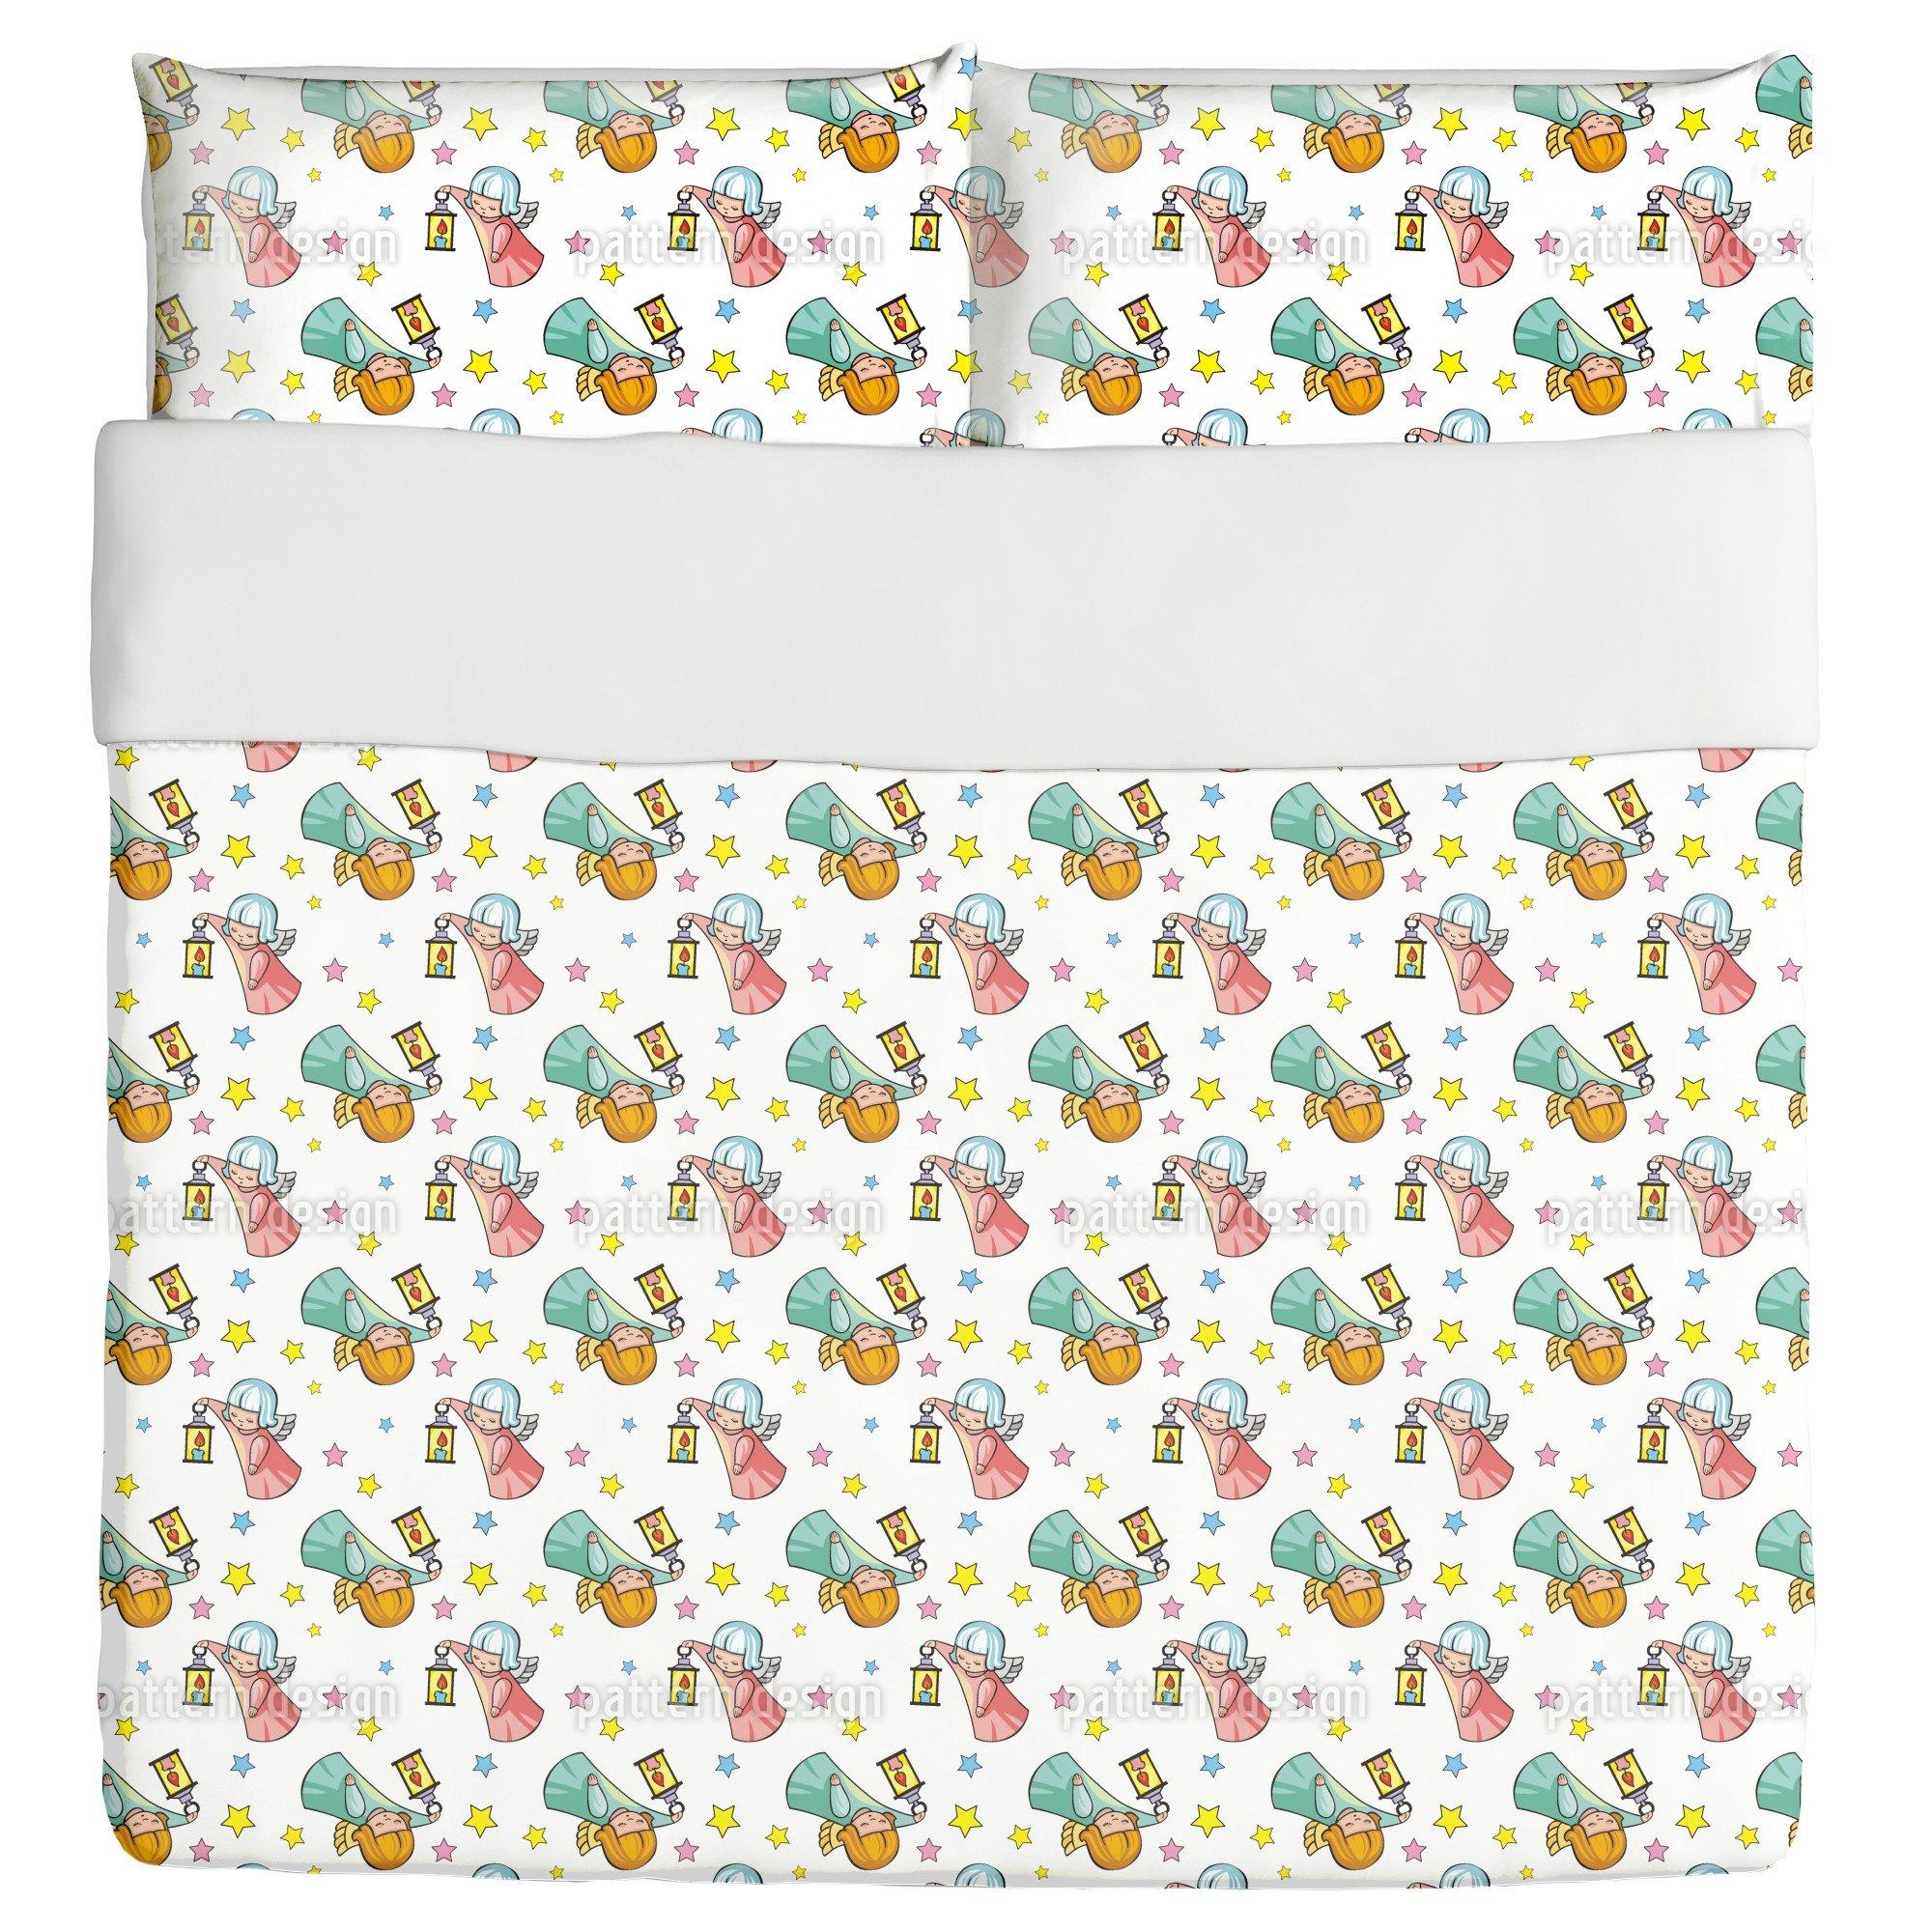 Cute Angels Duvet Bed Set 3 Piece Set Duvet Cover - 2 Pillow Shams - Luxury Microfiber, Soft, Breathable by uneekee